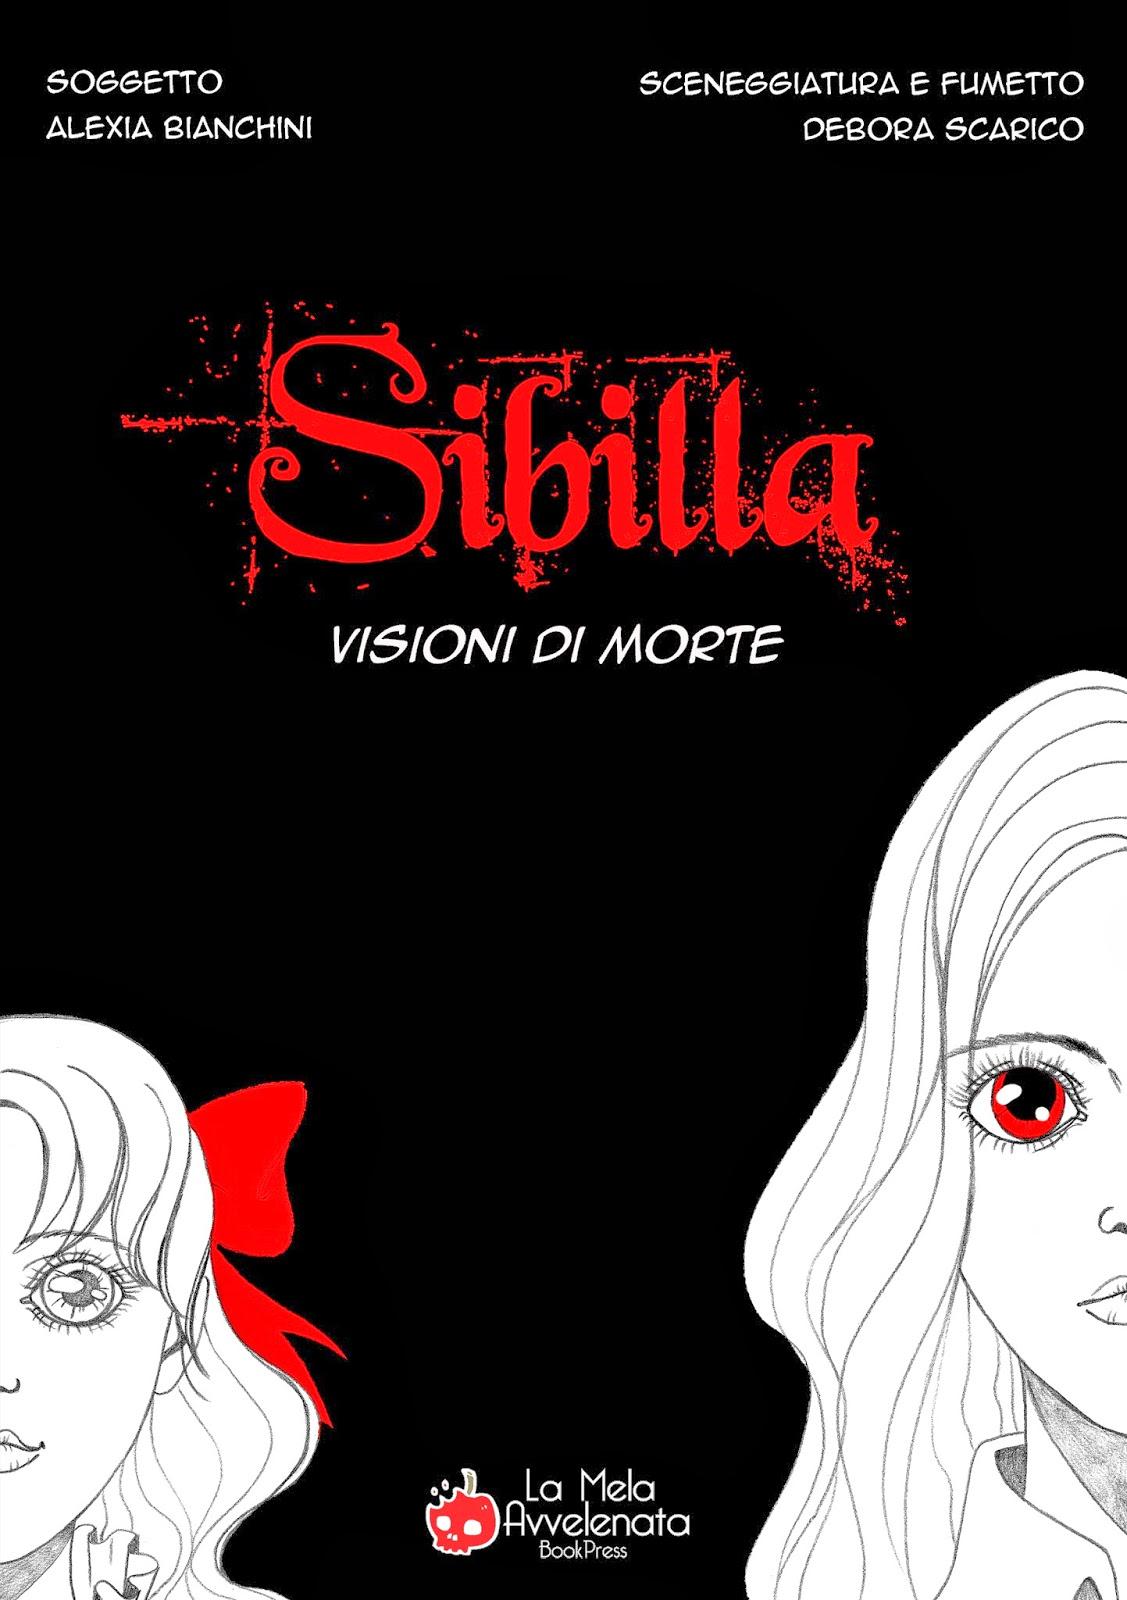 http://www.amazon.it/Sibilla-Visioni-morte-fumetto-Comics-ebook/dp/B00IG843GA/ref=sr_1_1?ie=UTF8&qid=1398963934&sr=8-1&keywords=sibilla+visioni+di+morte